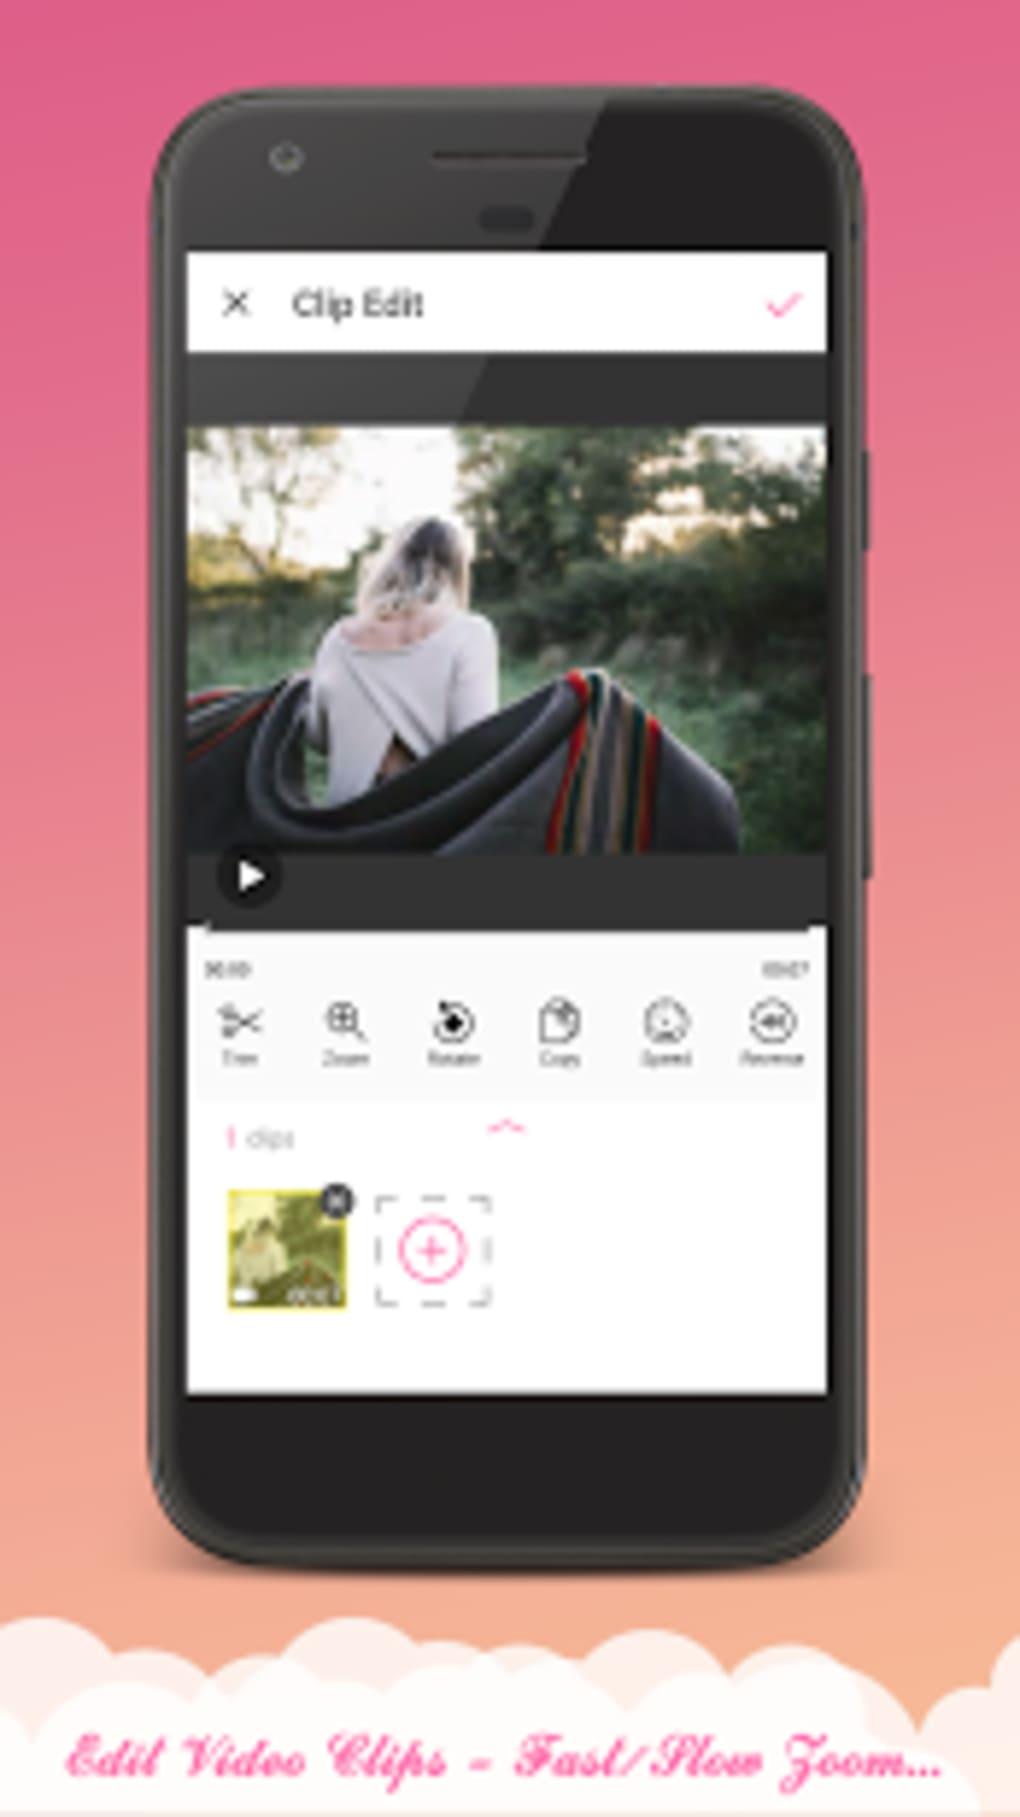 Vimady Video Editor Video Maker Gif Sticker Apk Untuk Android Unduh